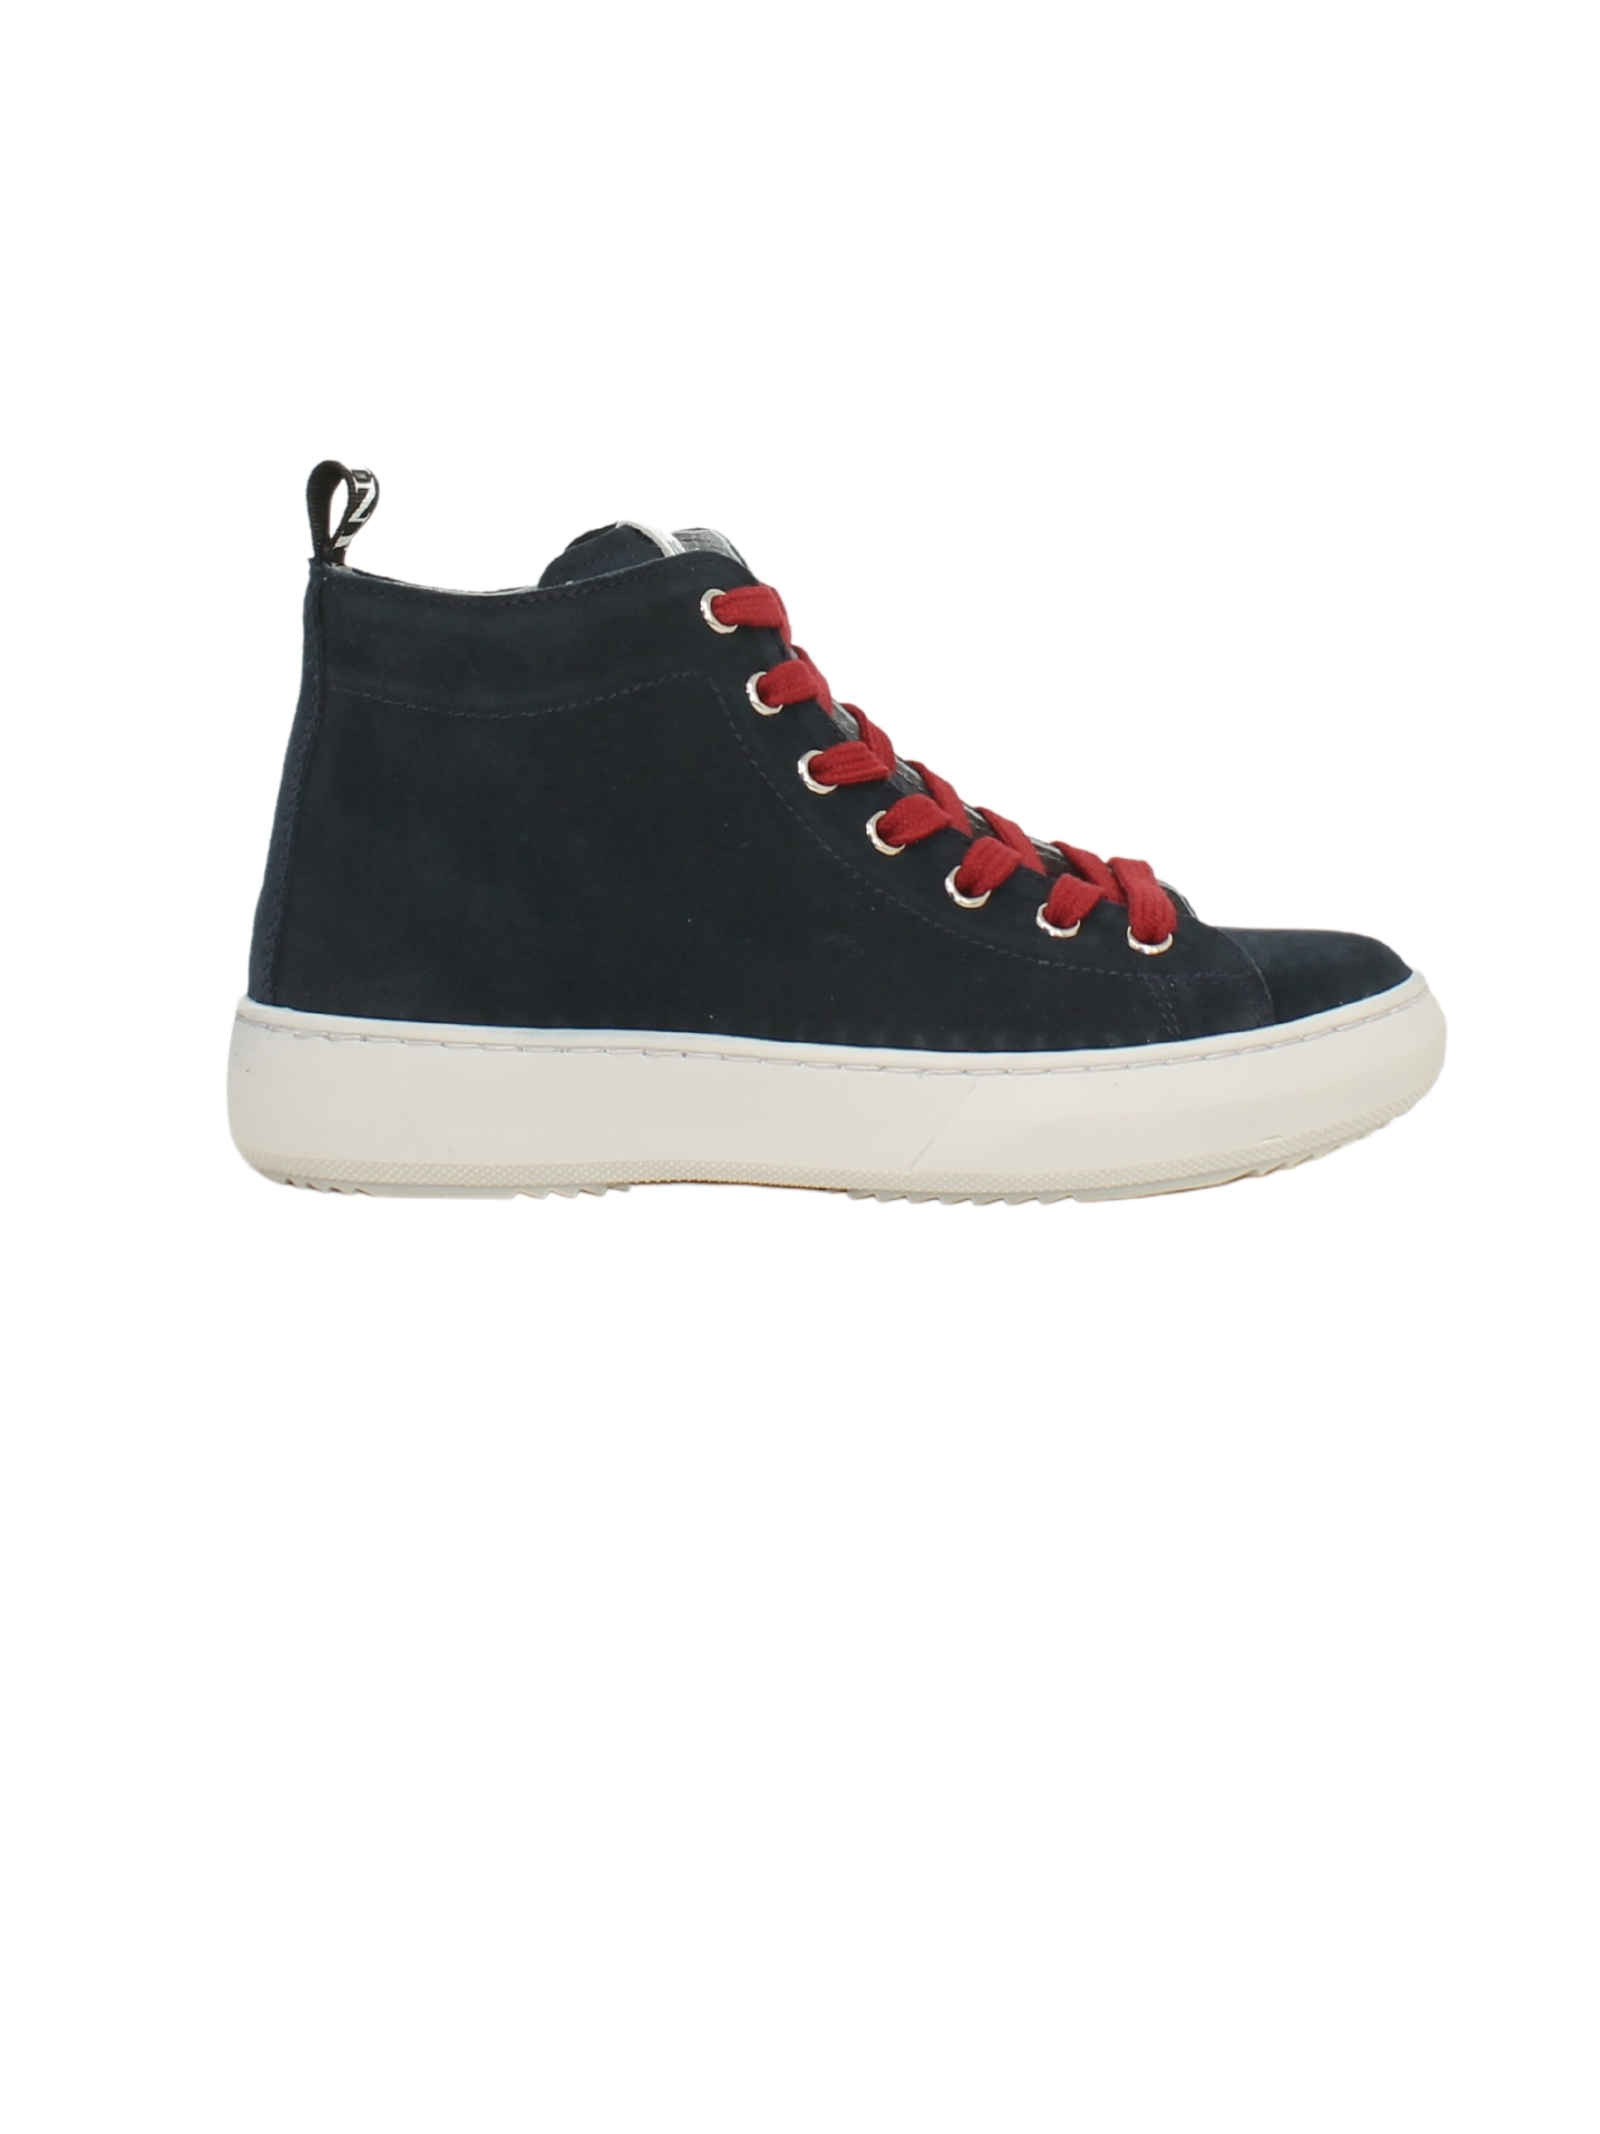 Sneakers Incanto Bambino NERO GIARDINI JUNIOR   Sneakers   134142M207